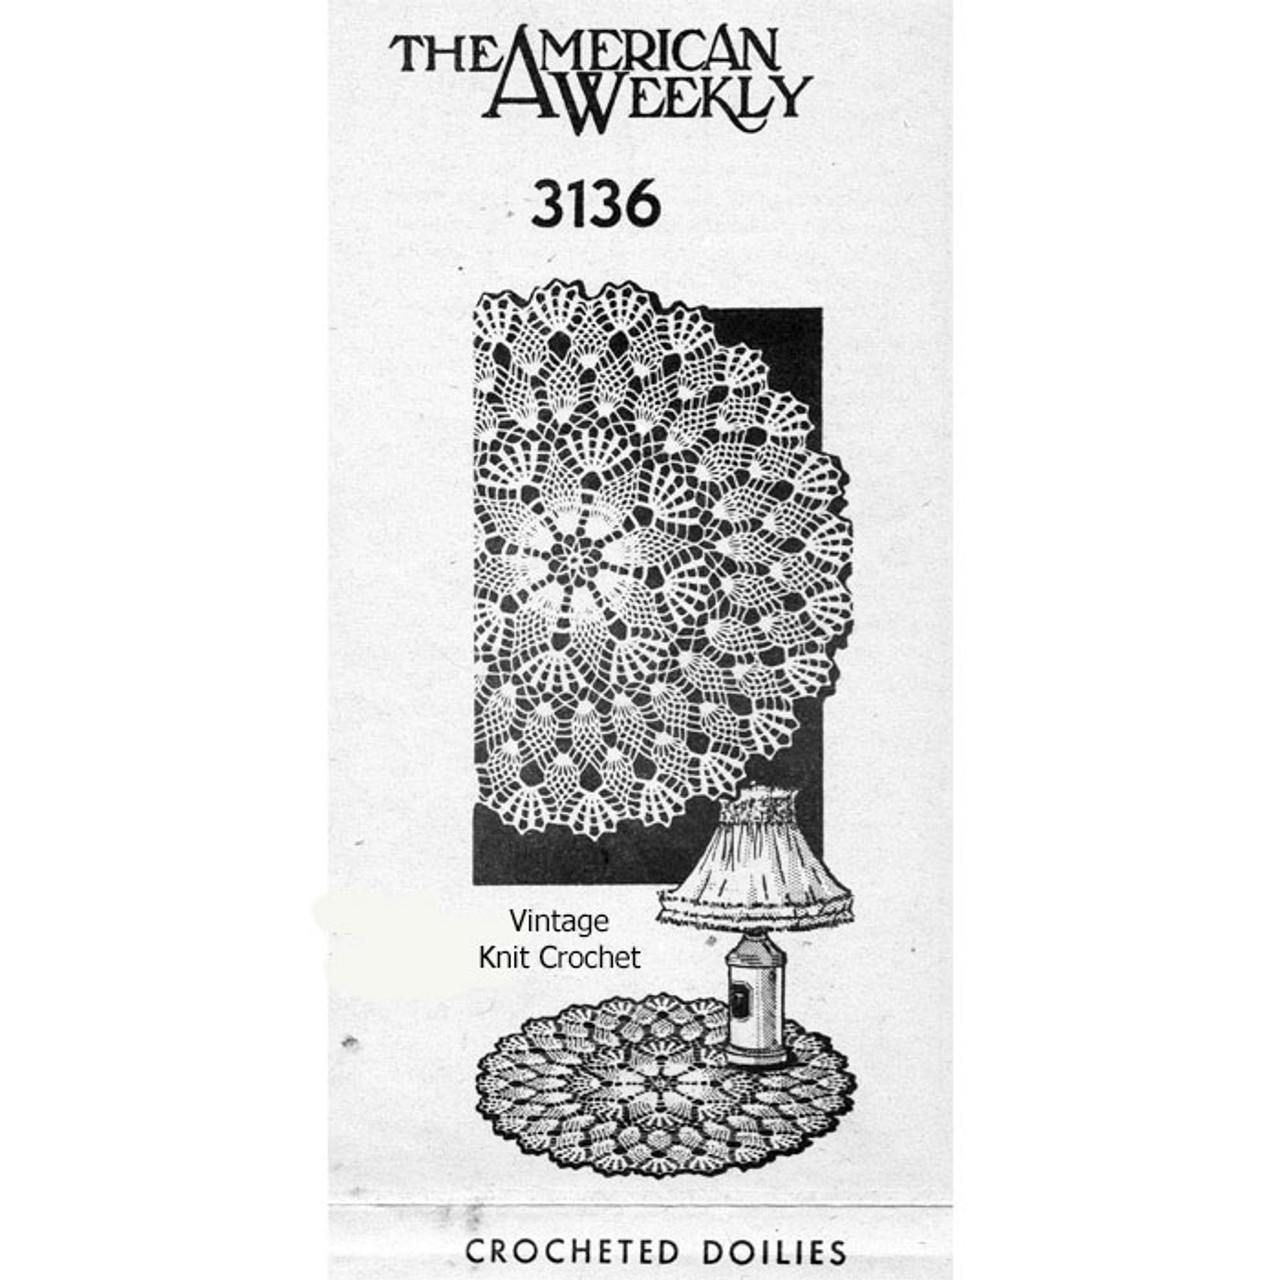 Pineapple Crochet Small Large Doilies Pattern Design 3136